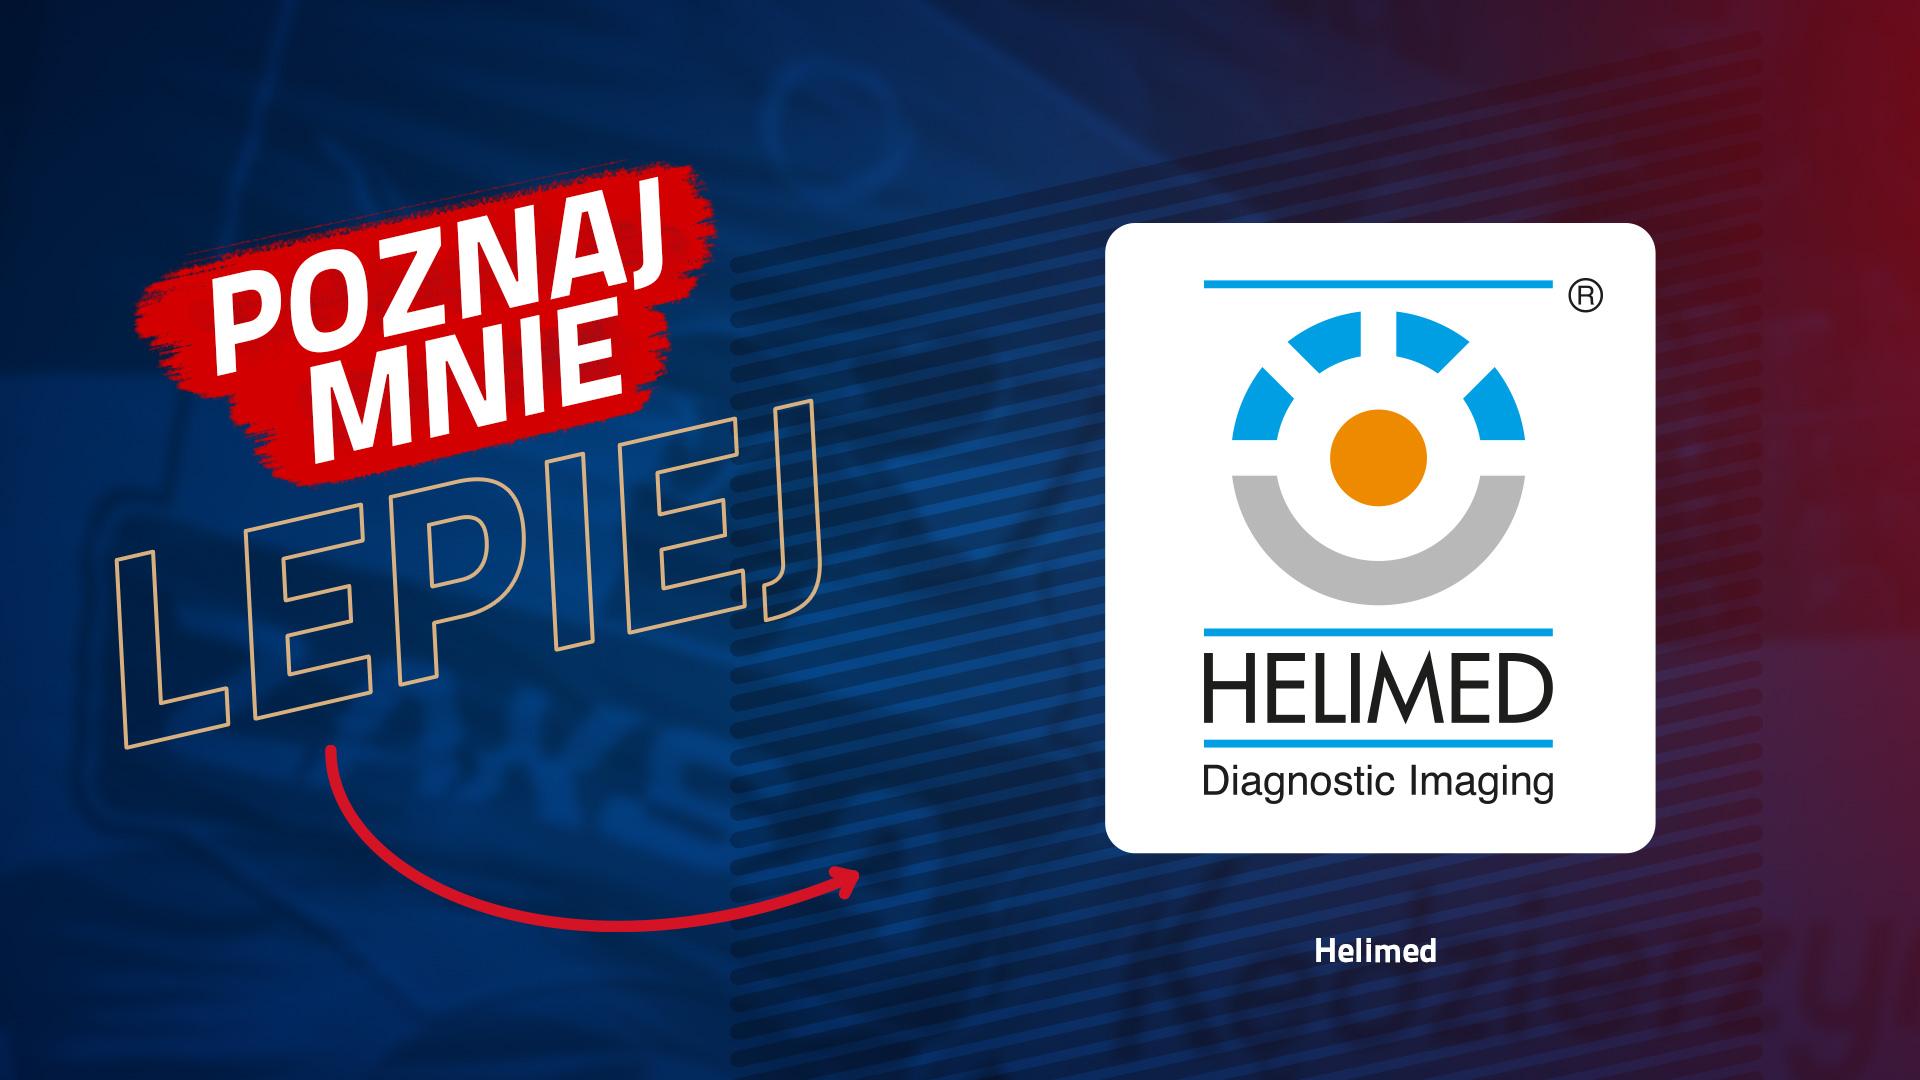 Poznaj mnie lepiej: HELIMED Diagnostic Imaging